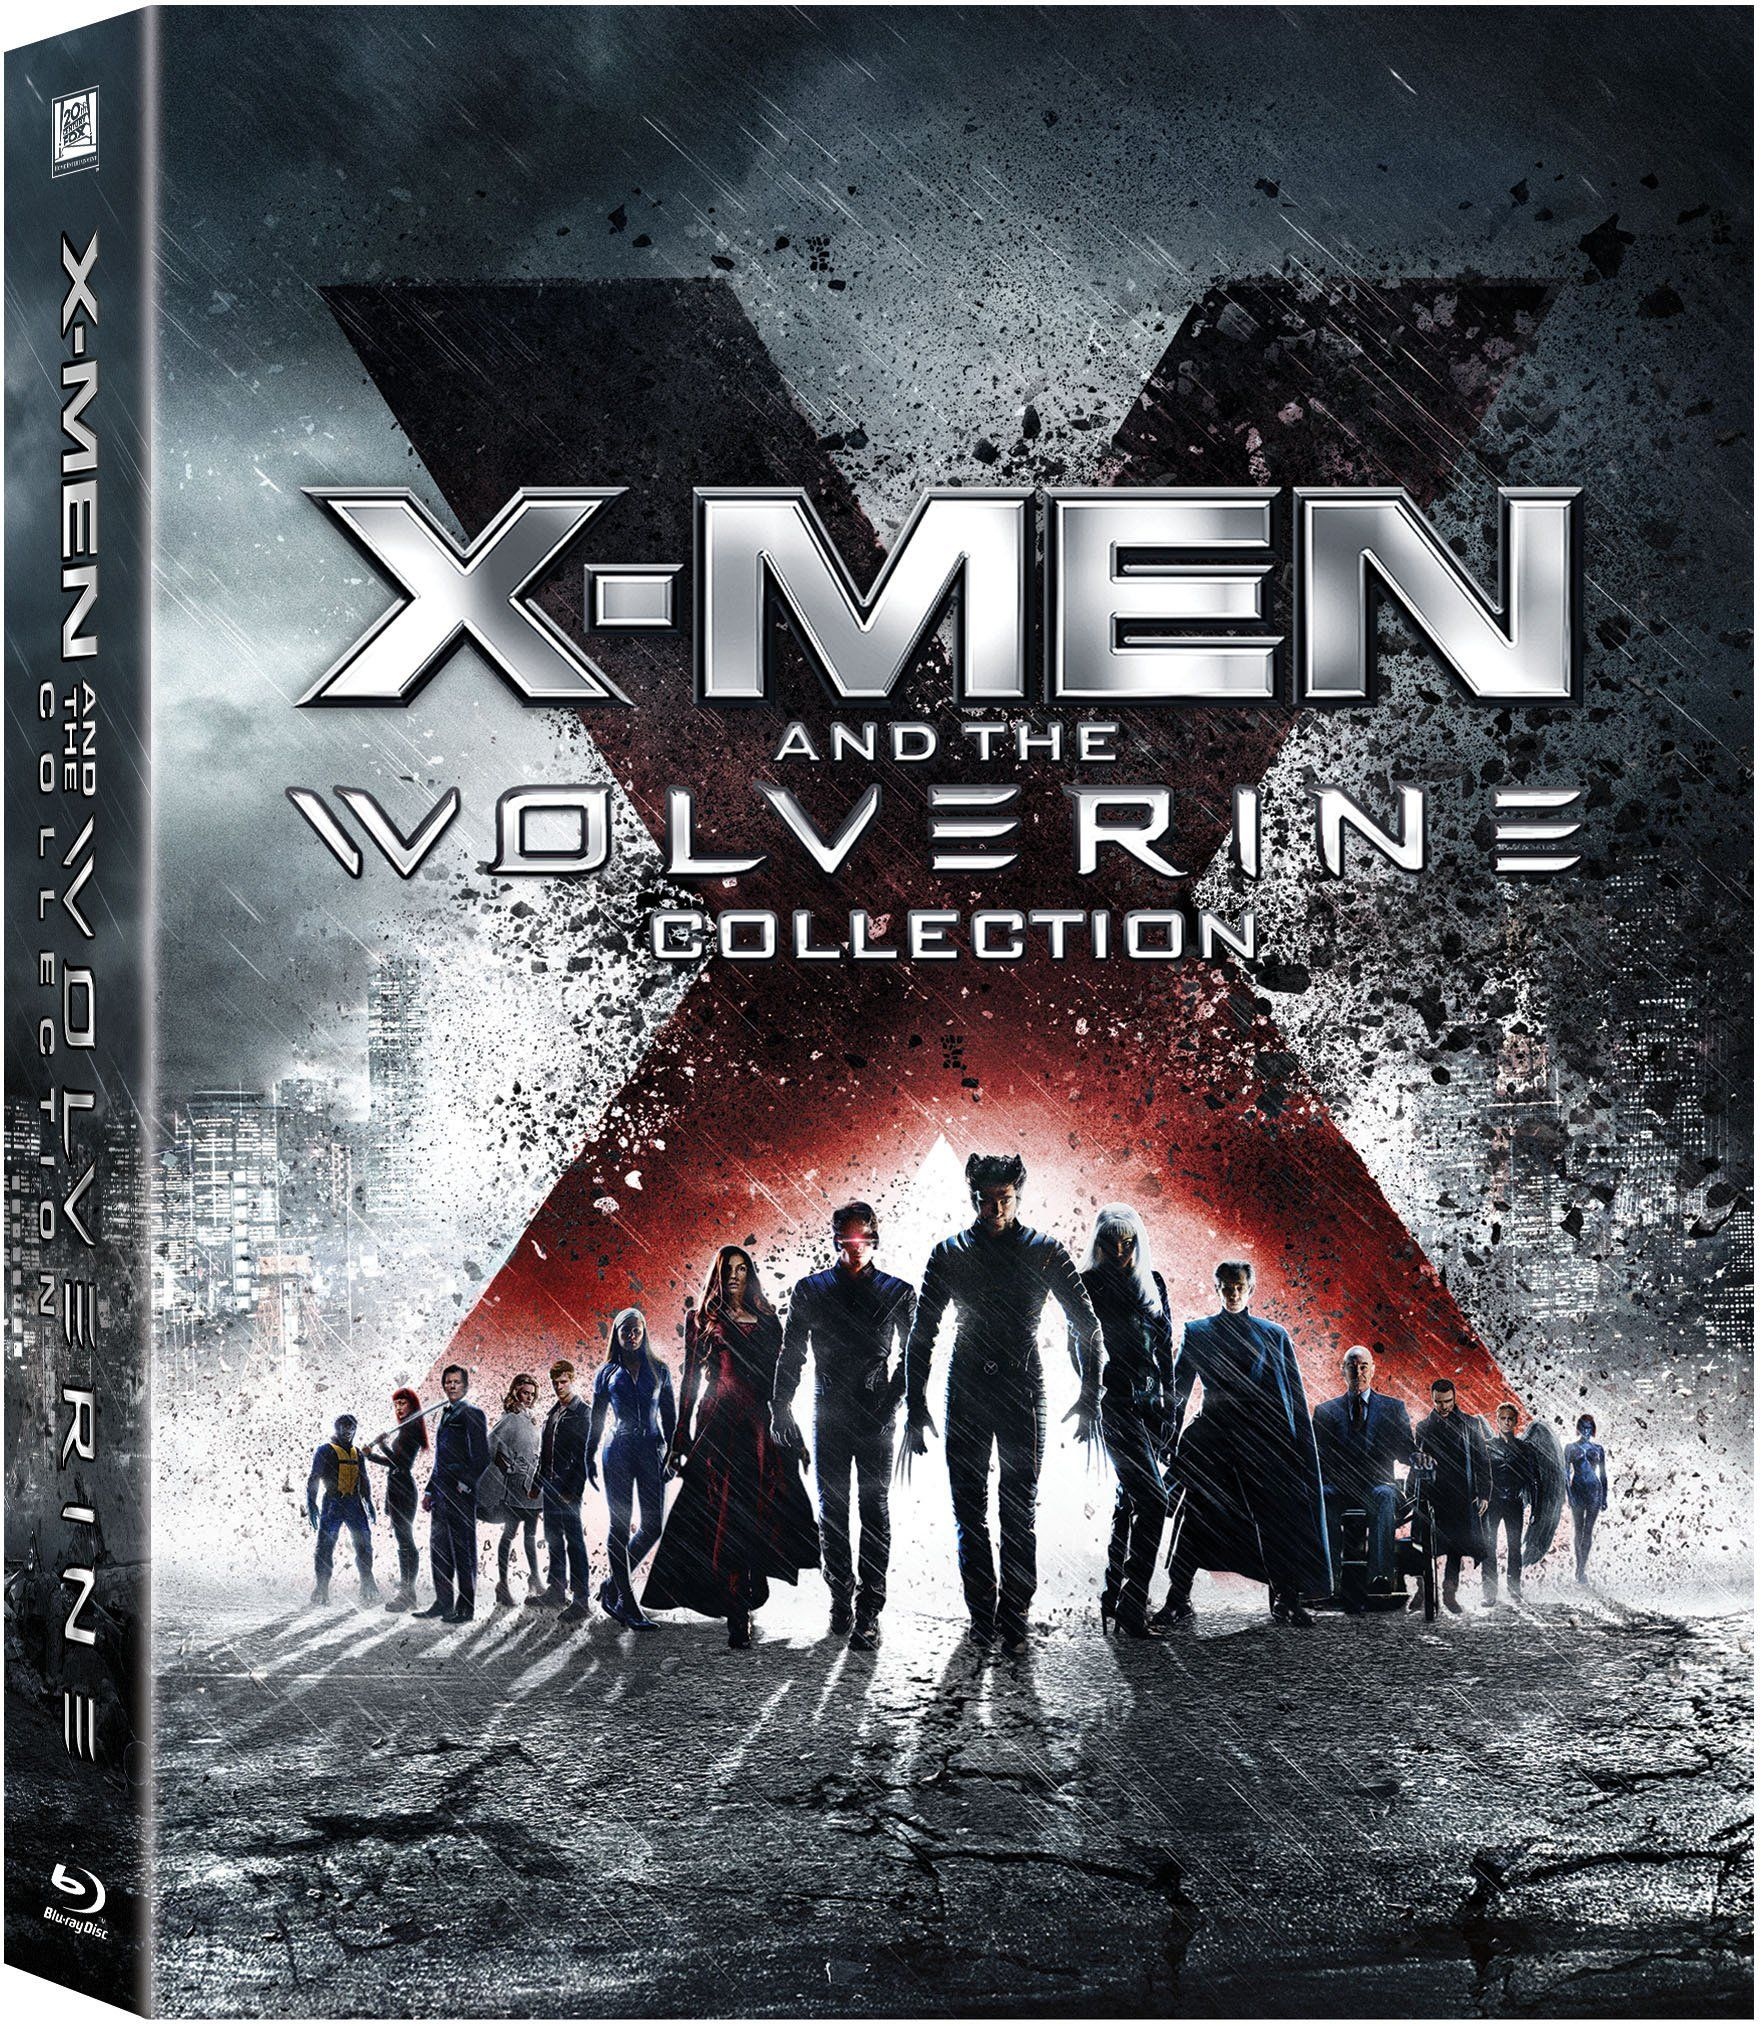 X Men And The Wolverine Collection X Men X2 X Men United X Men The Last Stand X Men Origins Wolverine X Men First Class The X Men Wolverine Wolverine Film